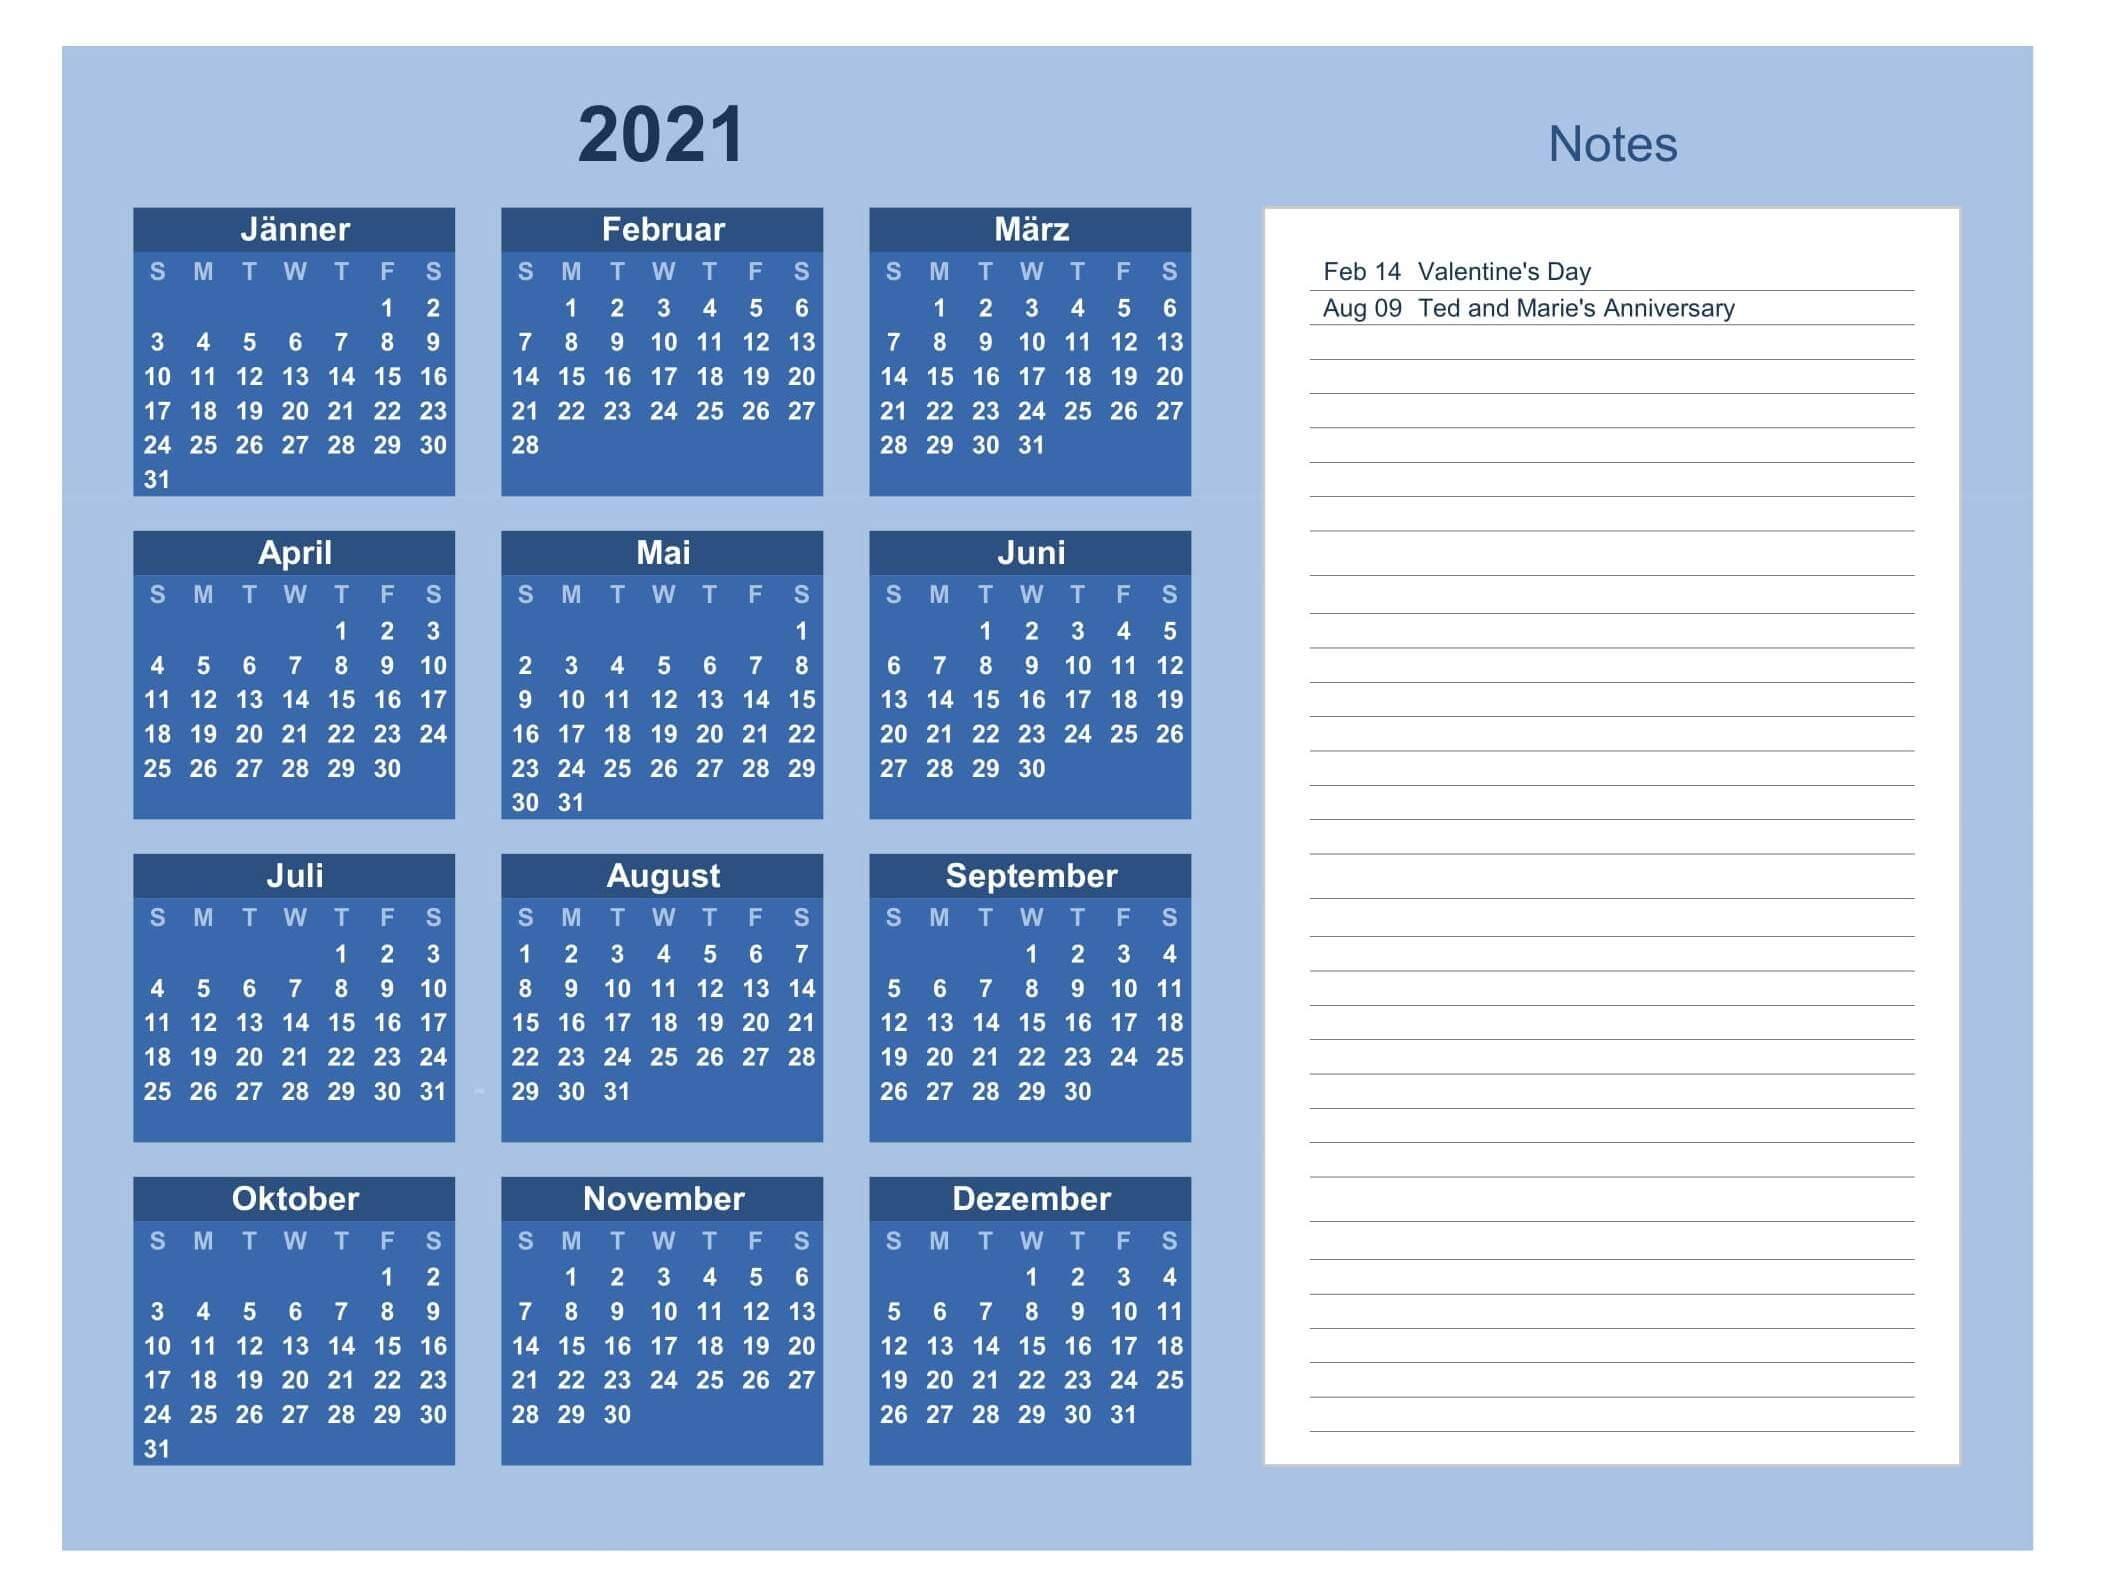 Printable Calendar 2021 With Notes